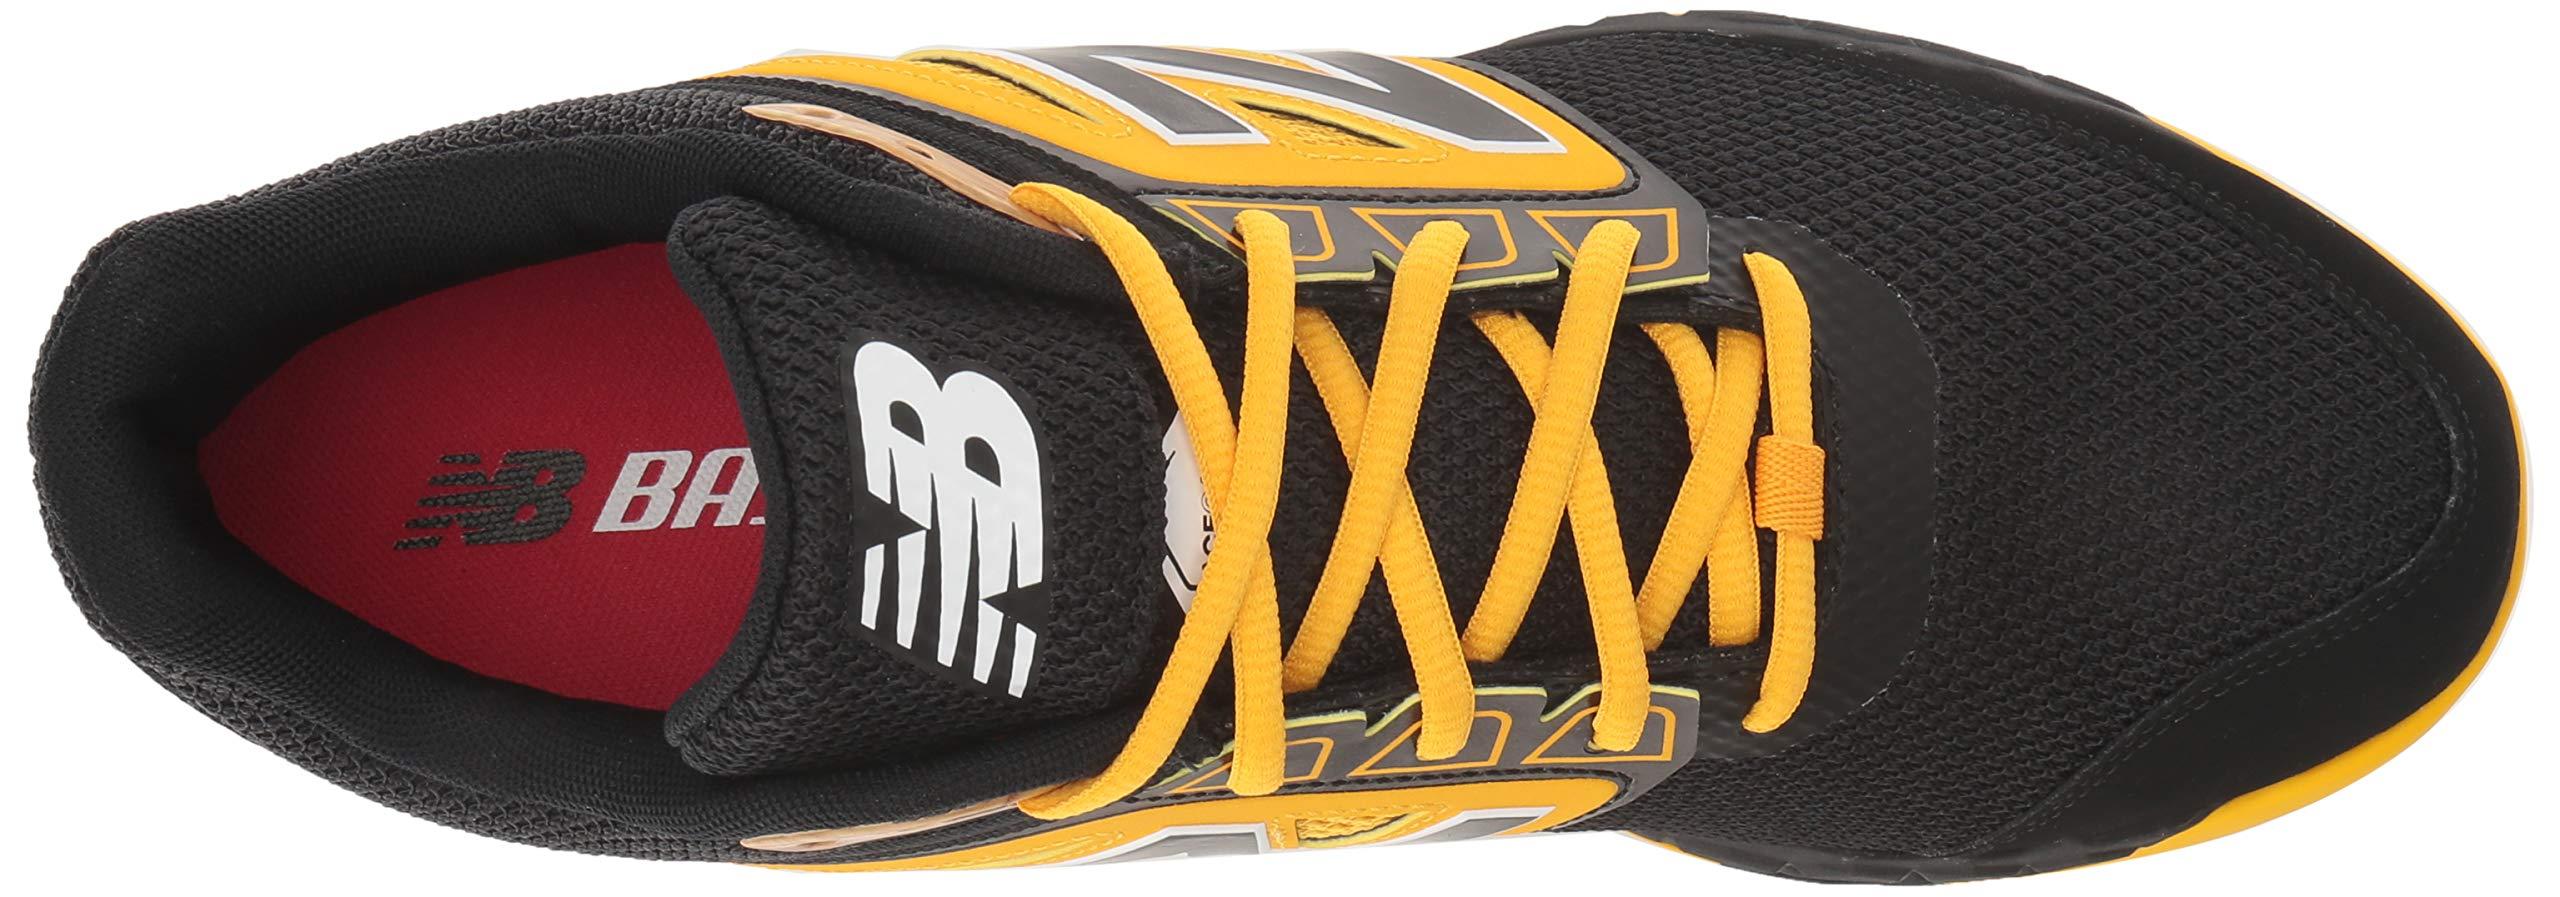 New Balance Men's 3000v4 Turf Baseball Shoe, Black/Yellow, 5 D US by New Balance (Image #8)